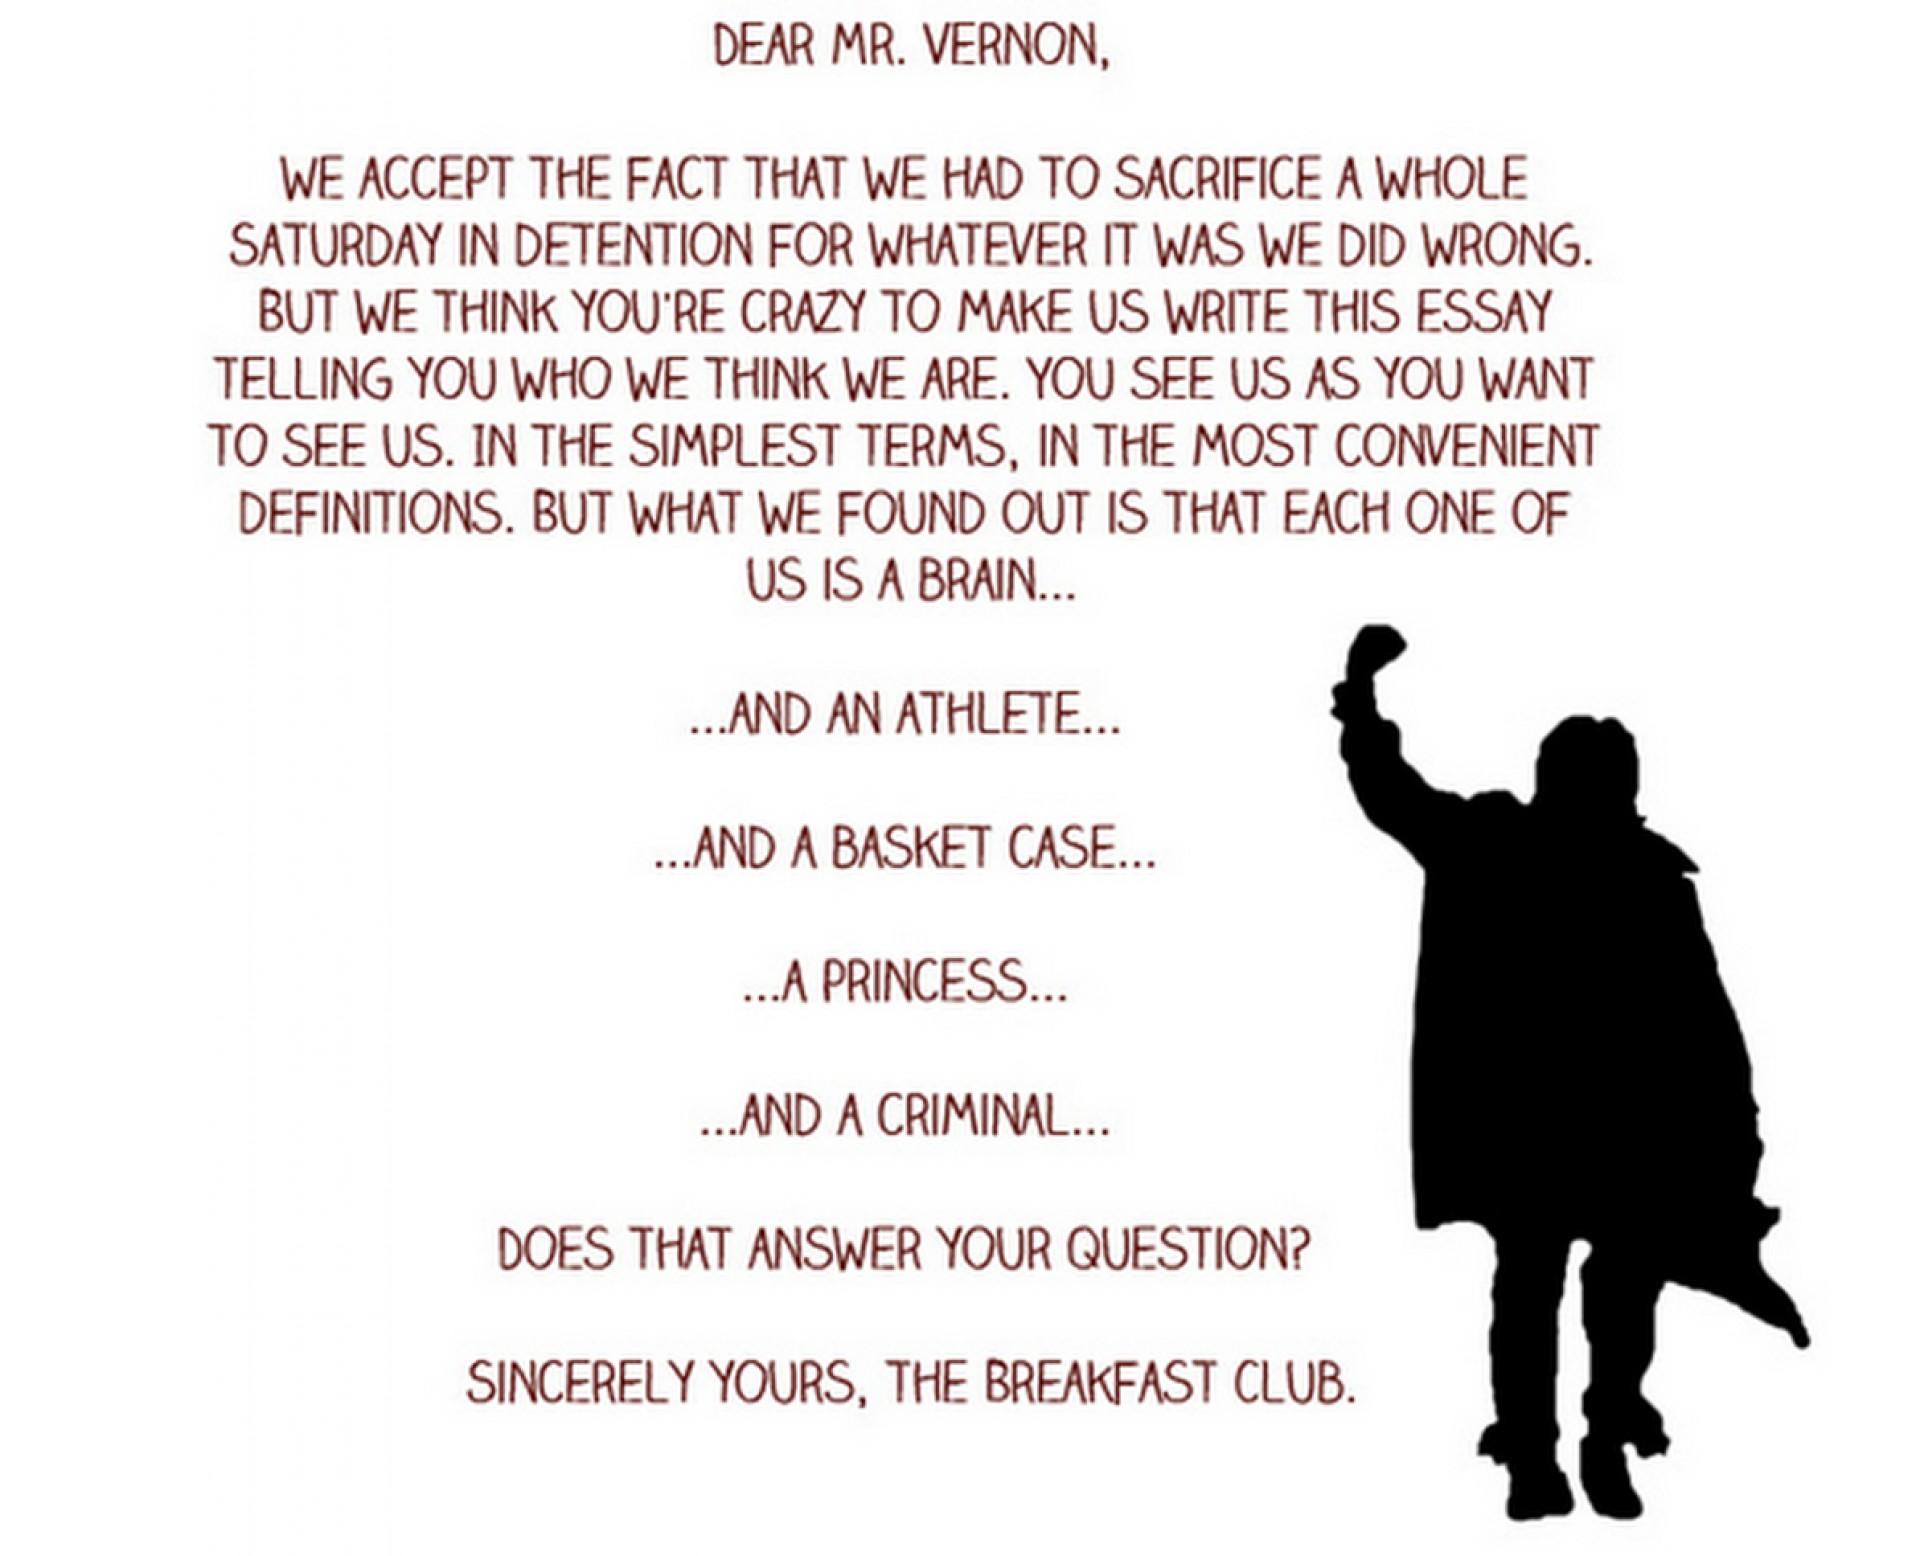 004 Essay Example The Breakfast Breathtaking Club Scene Introduction Analysis 1920